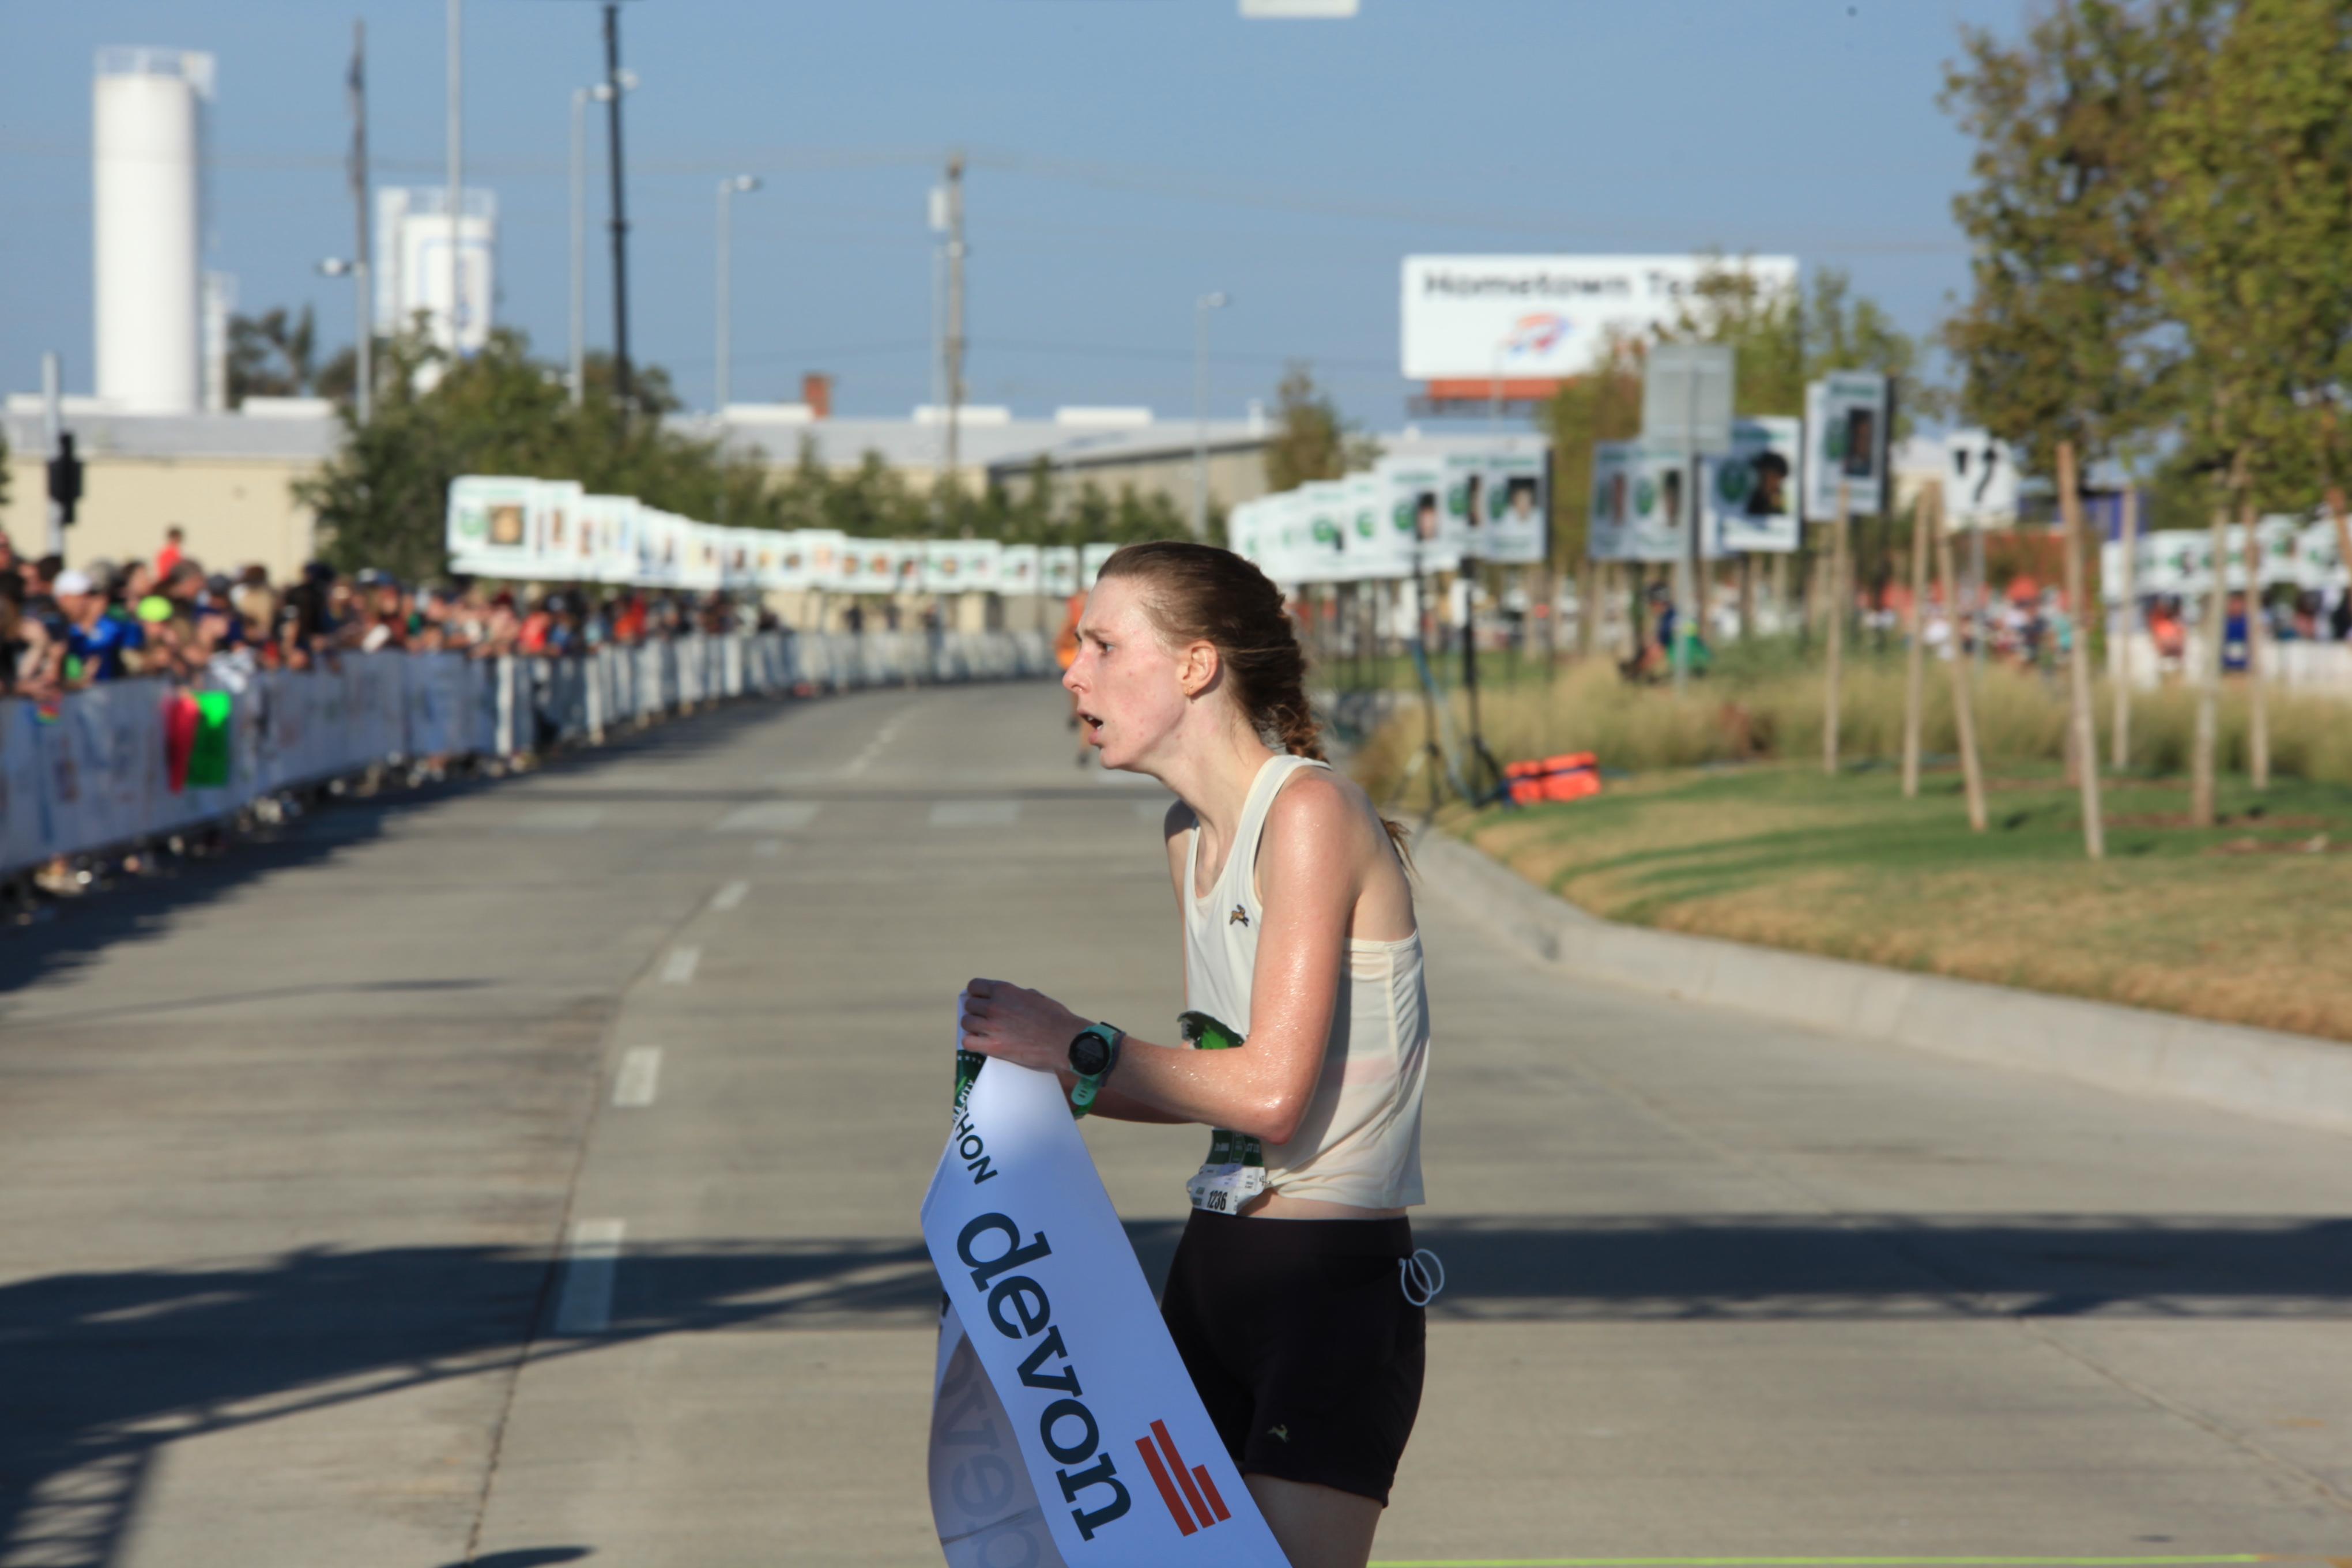 Layne Hammer wins the Women's Oklahoma City Memorial Marathon 2021